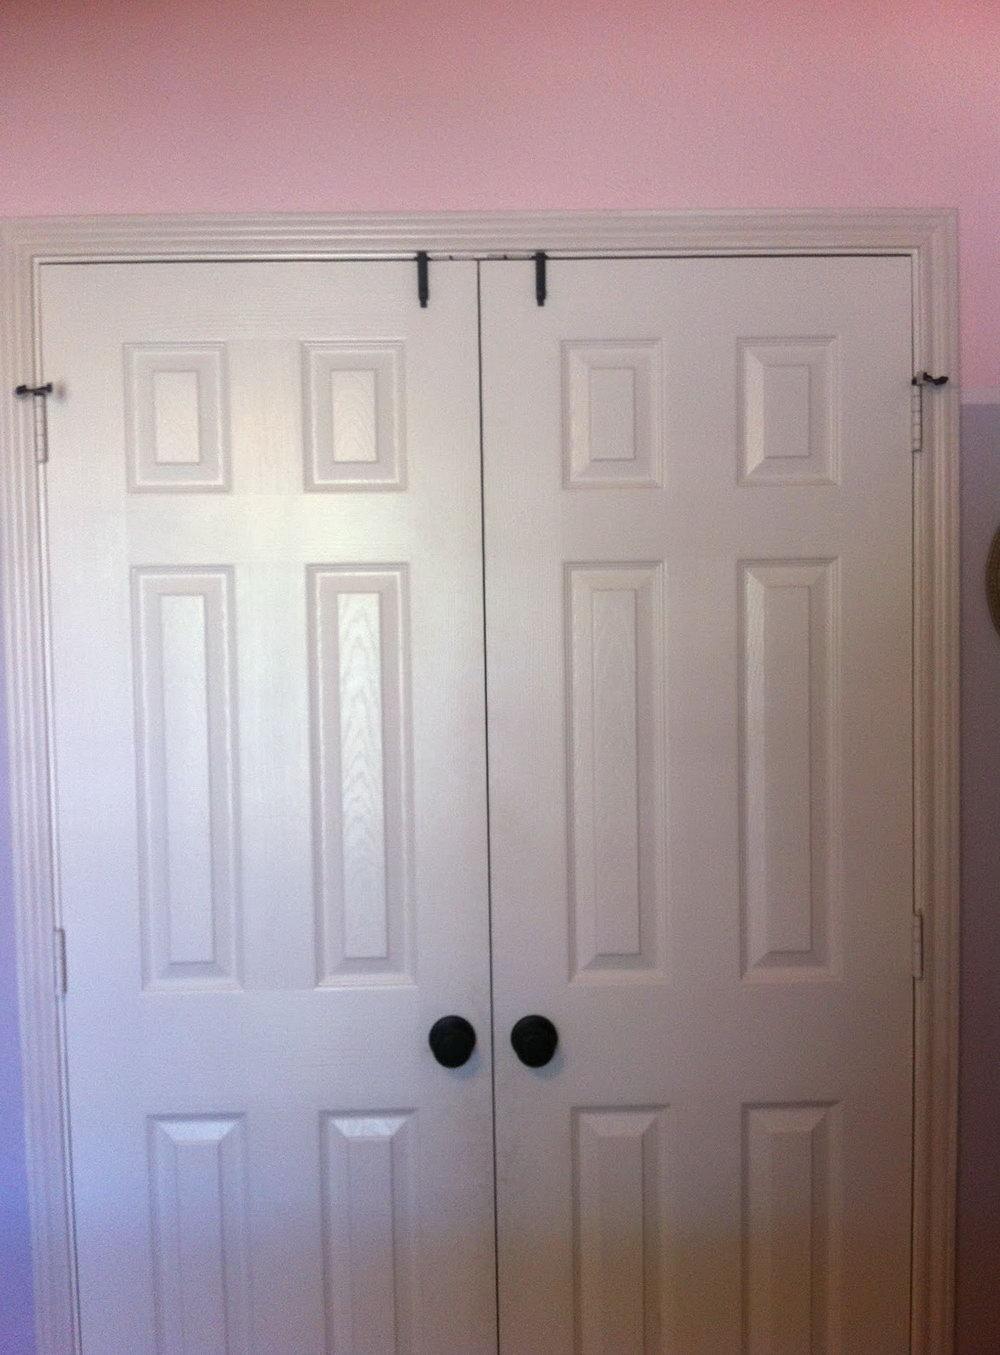 Wardrobe Closet With Lock